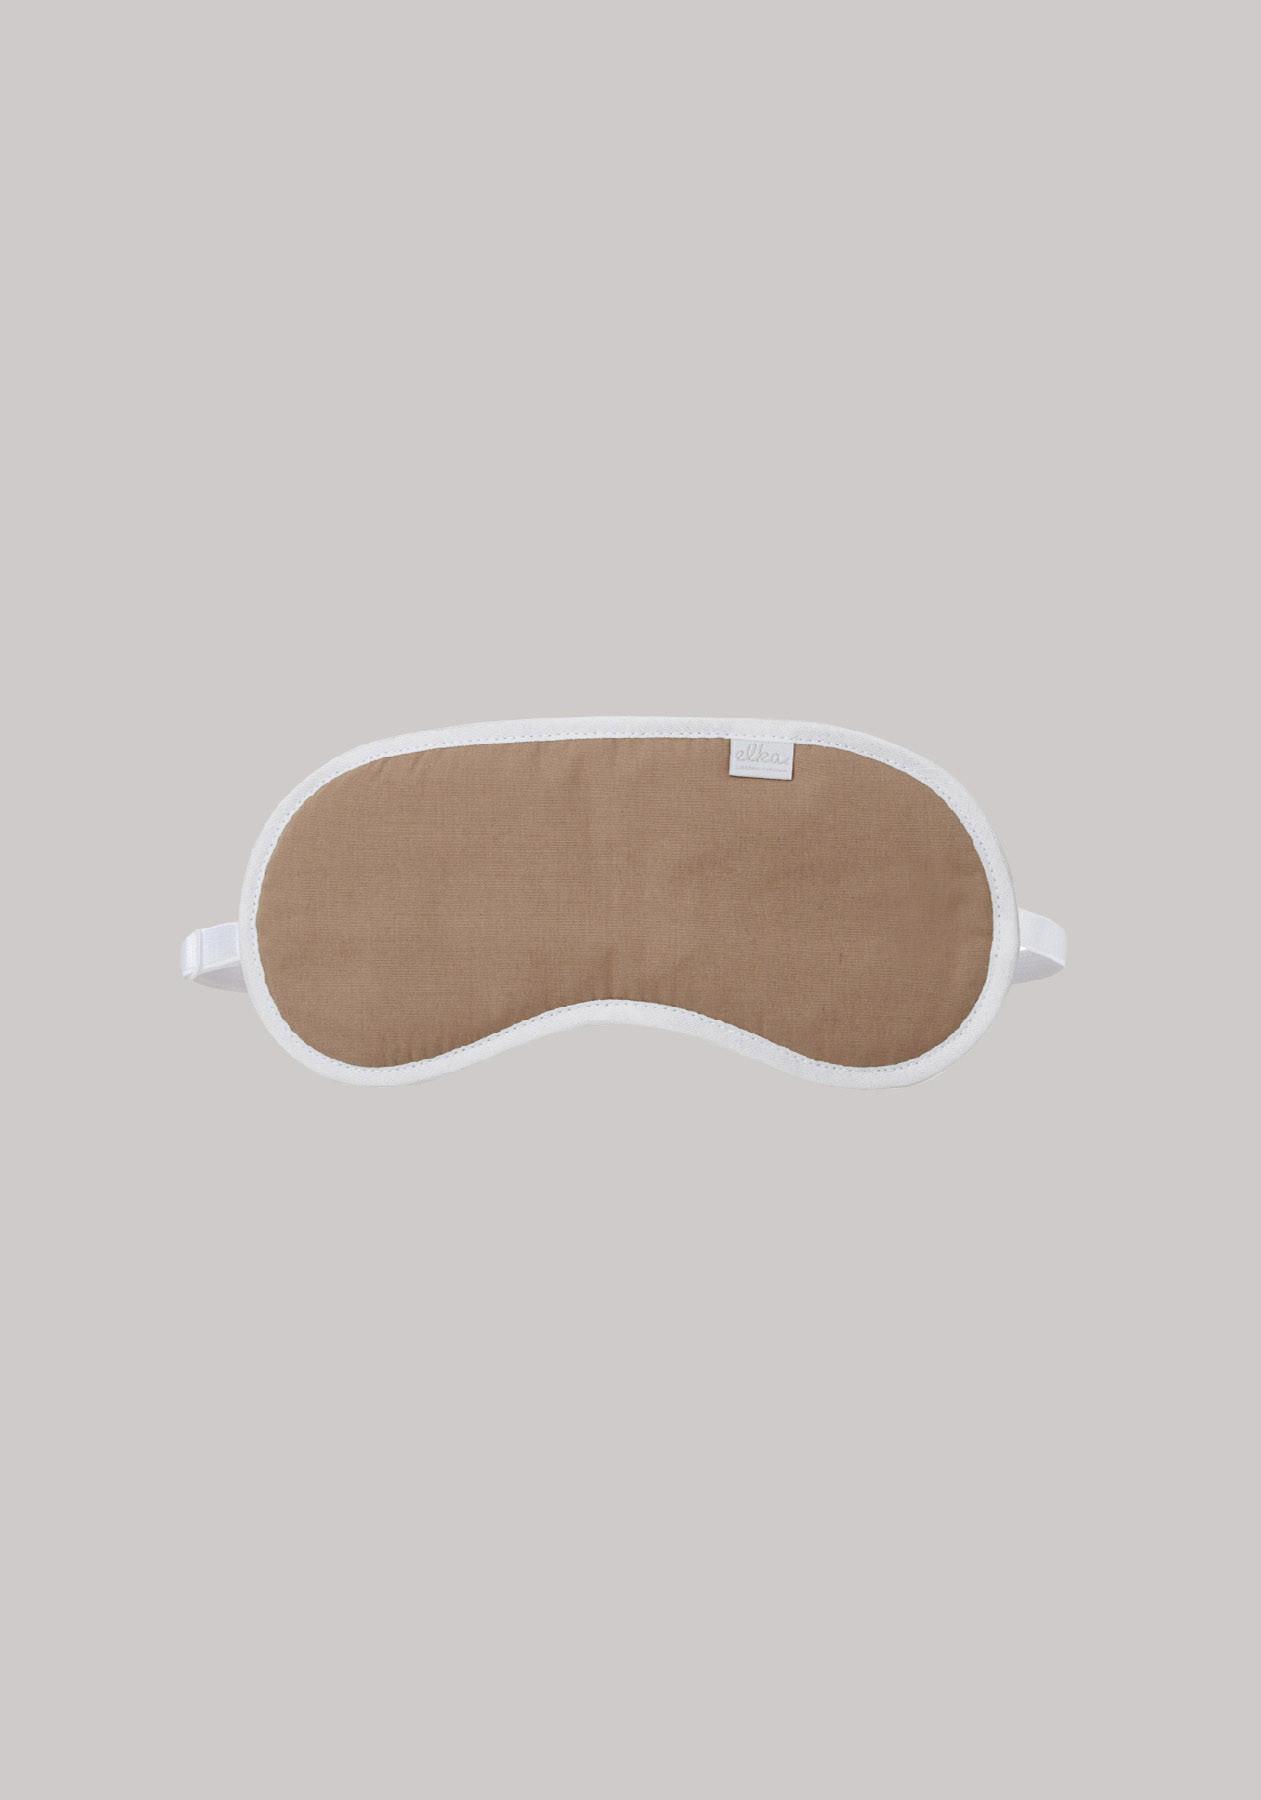 Deco_Home-Sleepmasks-ELKA-Lounge-H00595